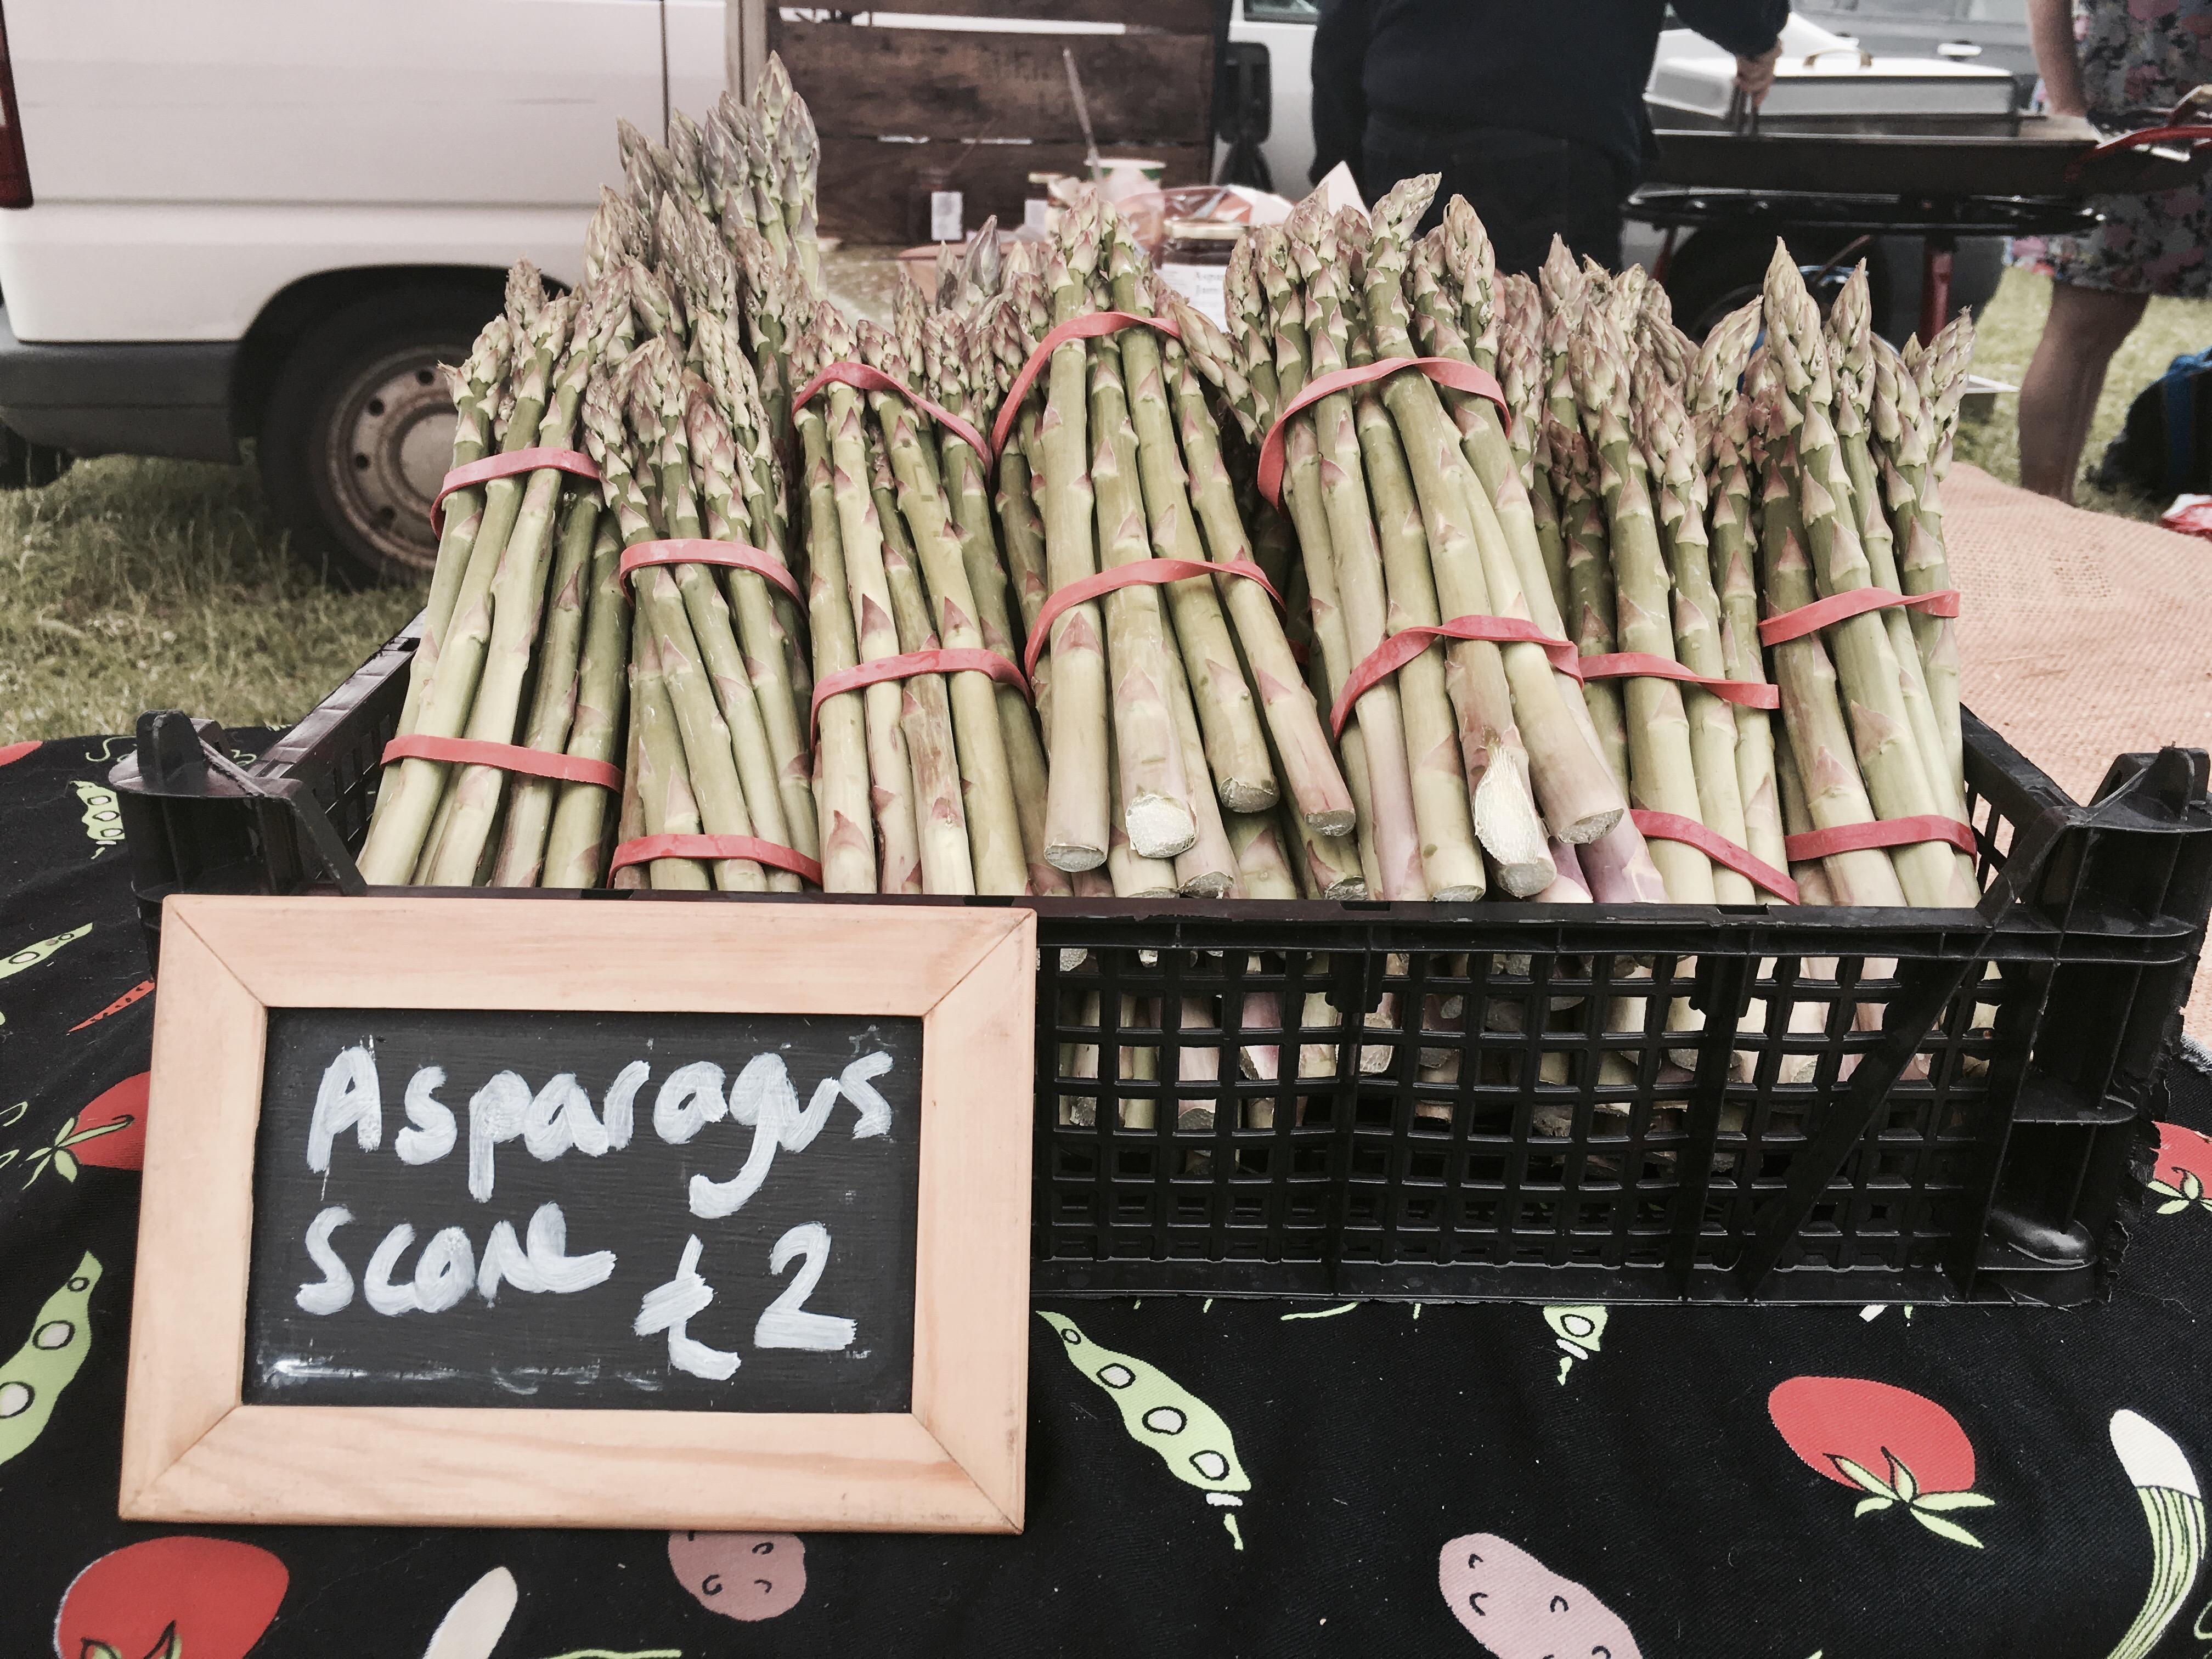 Asparagus for sale at Asparafest, Evesham, Worcestershire.